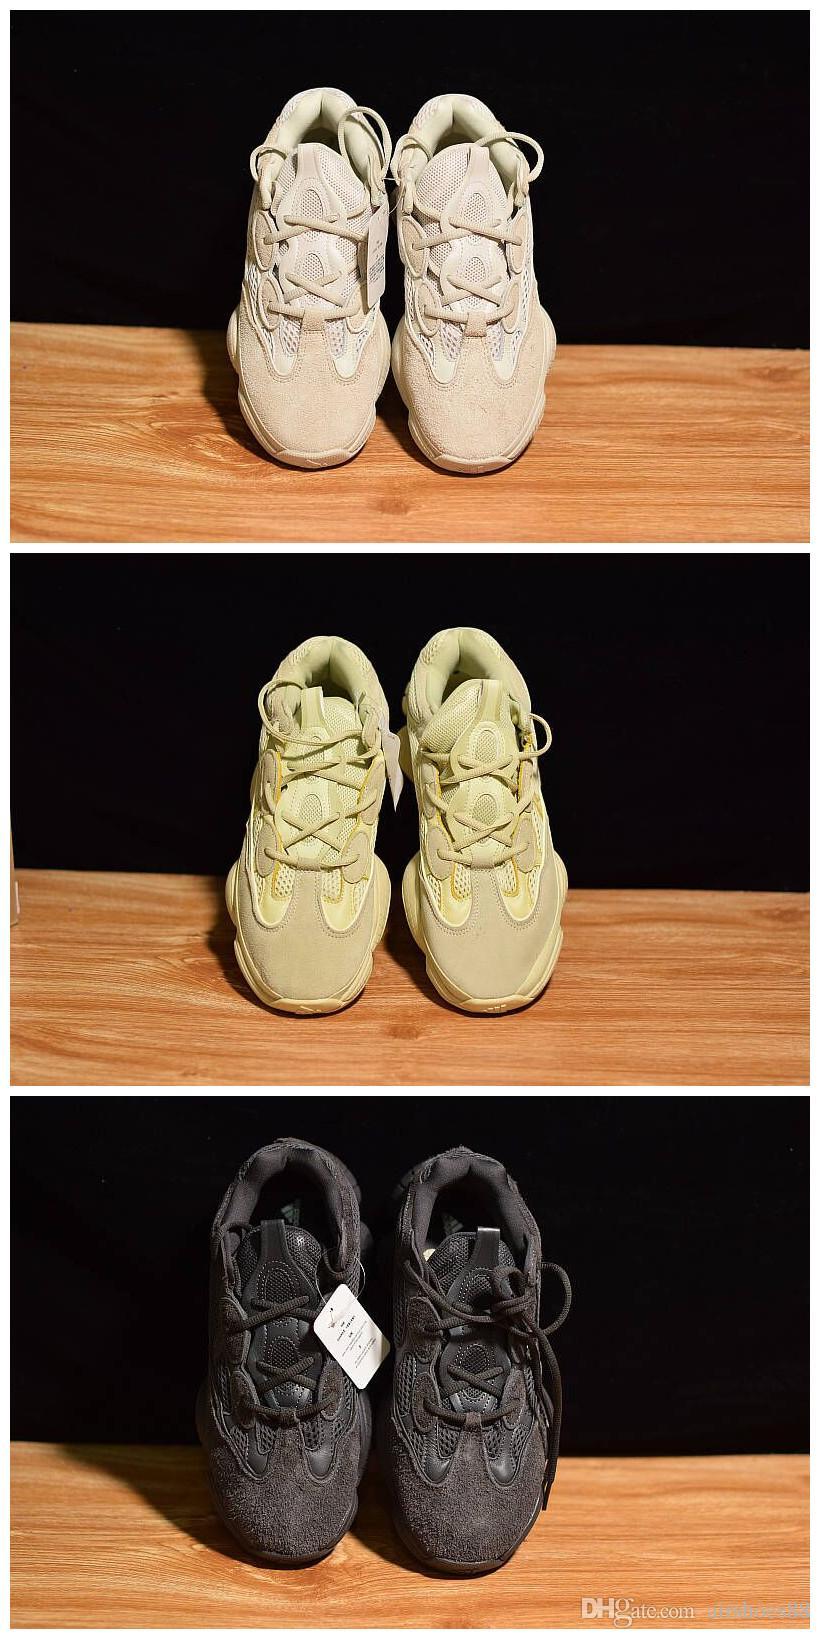 New 2019 Top quality Discount Blush KANYE 500 Kanye Sneakers Desert Rat 500 Mens Running Shoes Sport Shoe Man Sports Men Fashion Sneaker